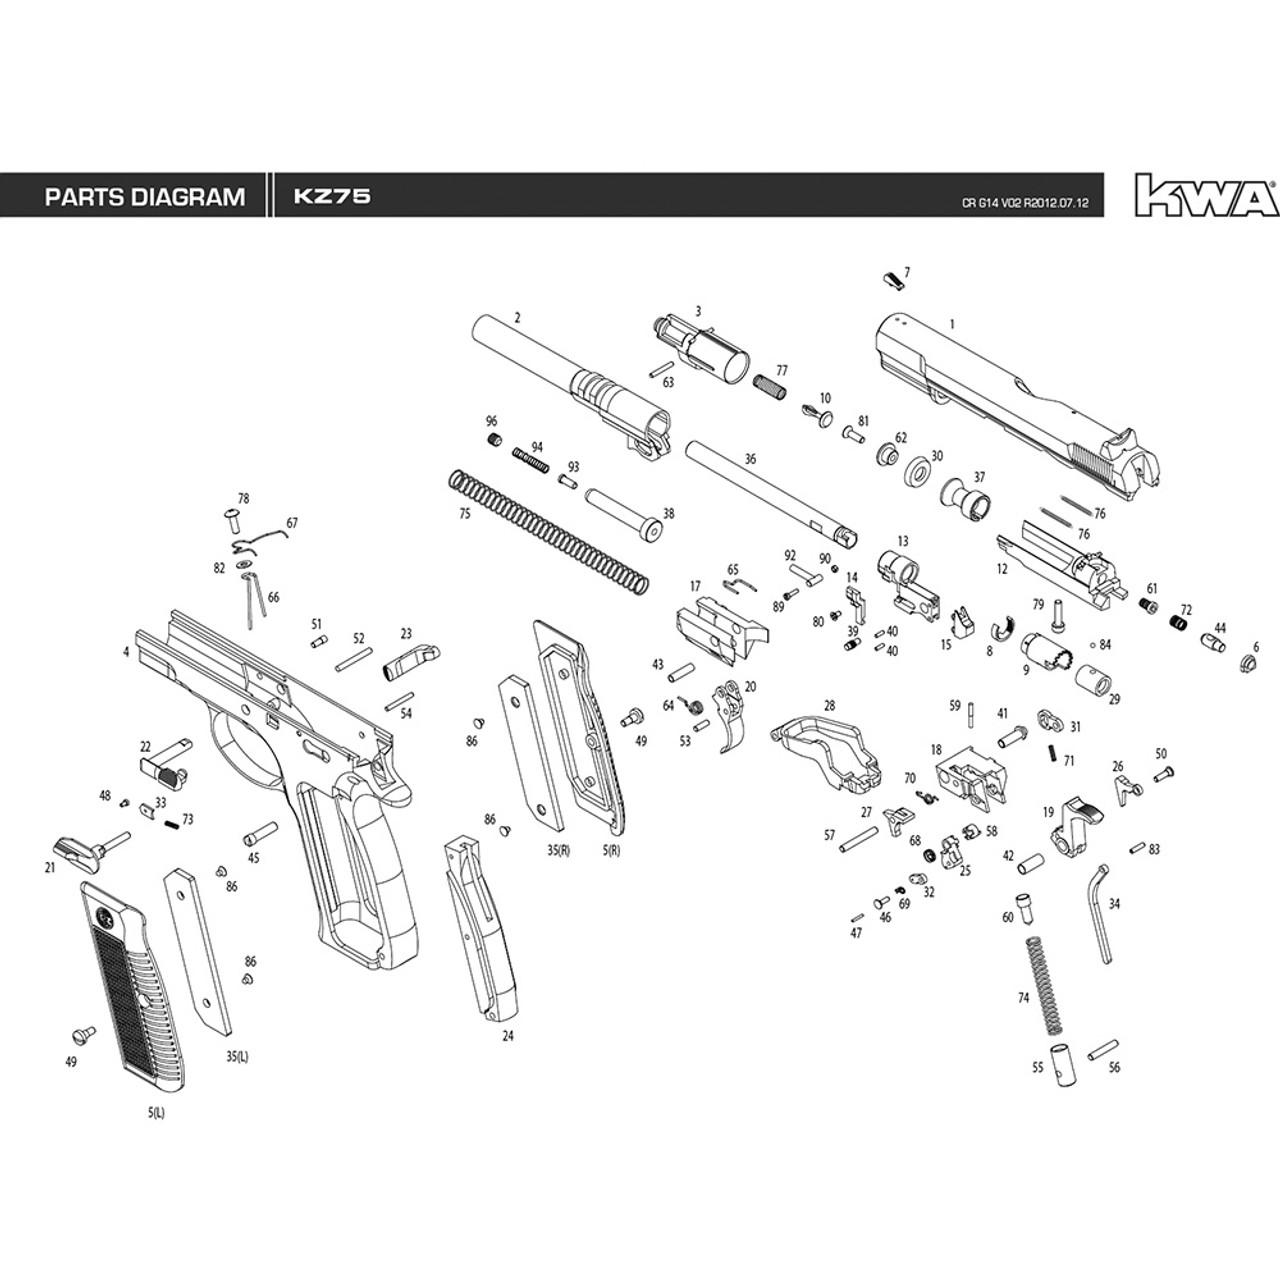 medium resolution of kwa airsoft kz75 pistol diagram